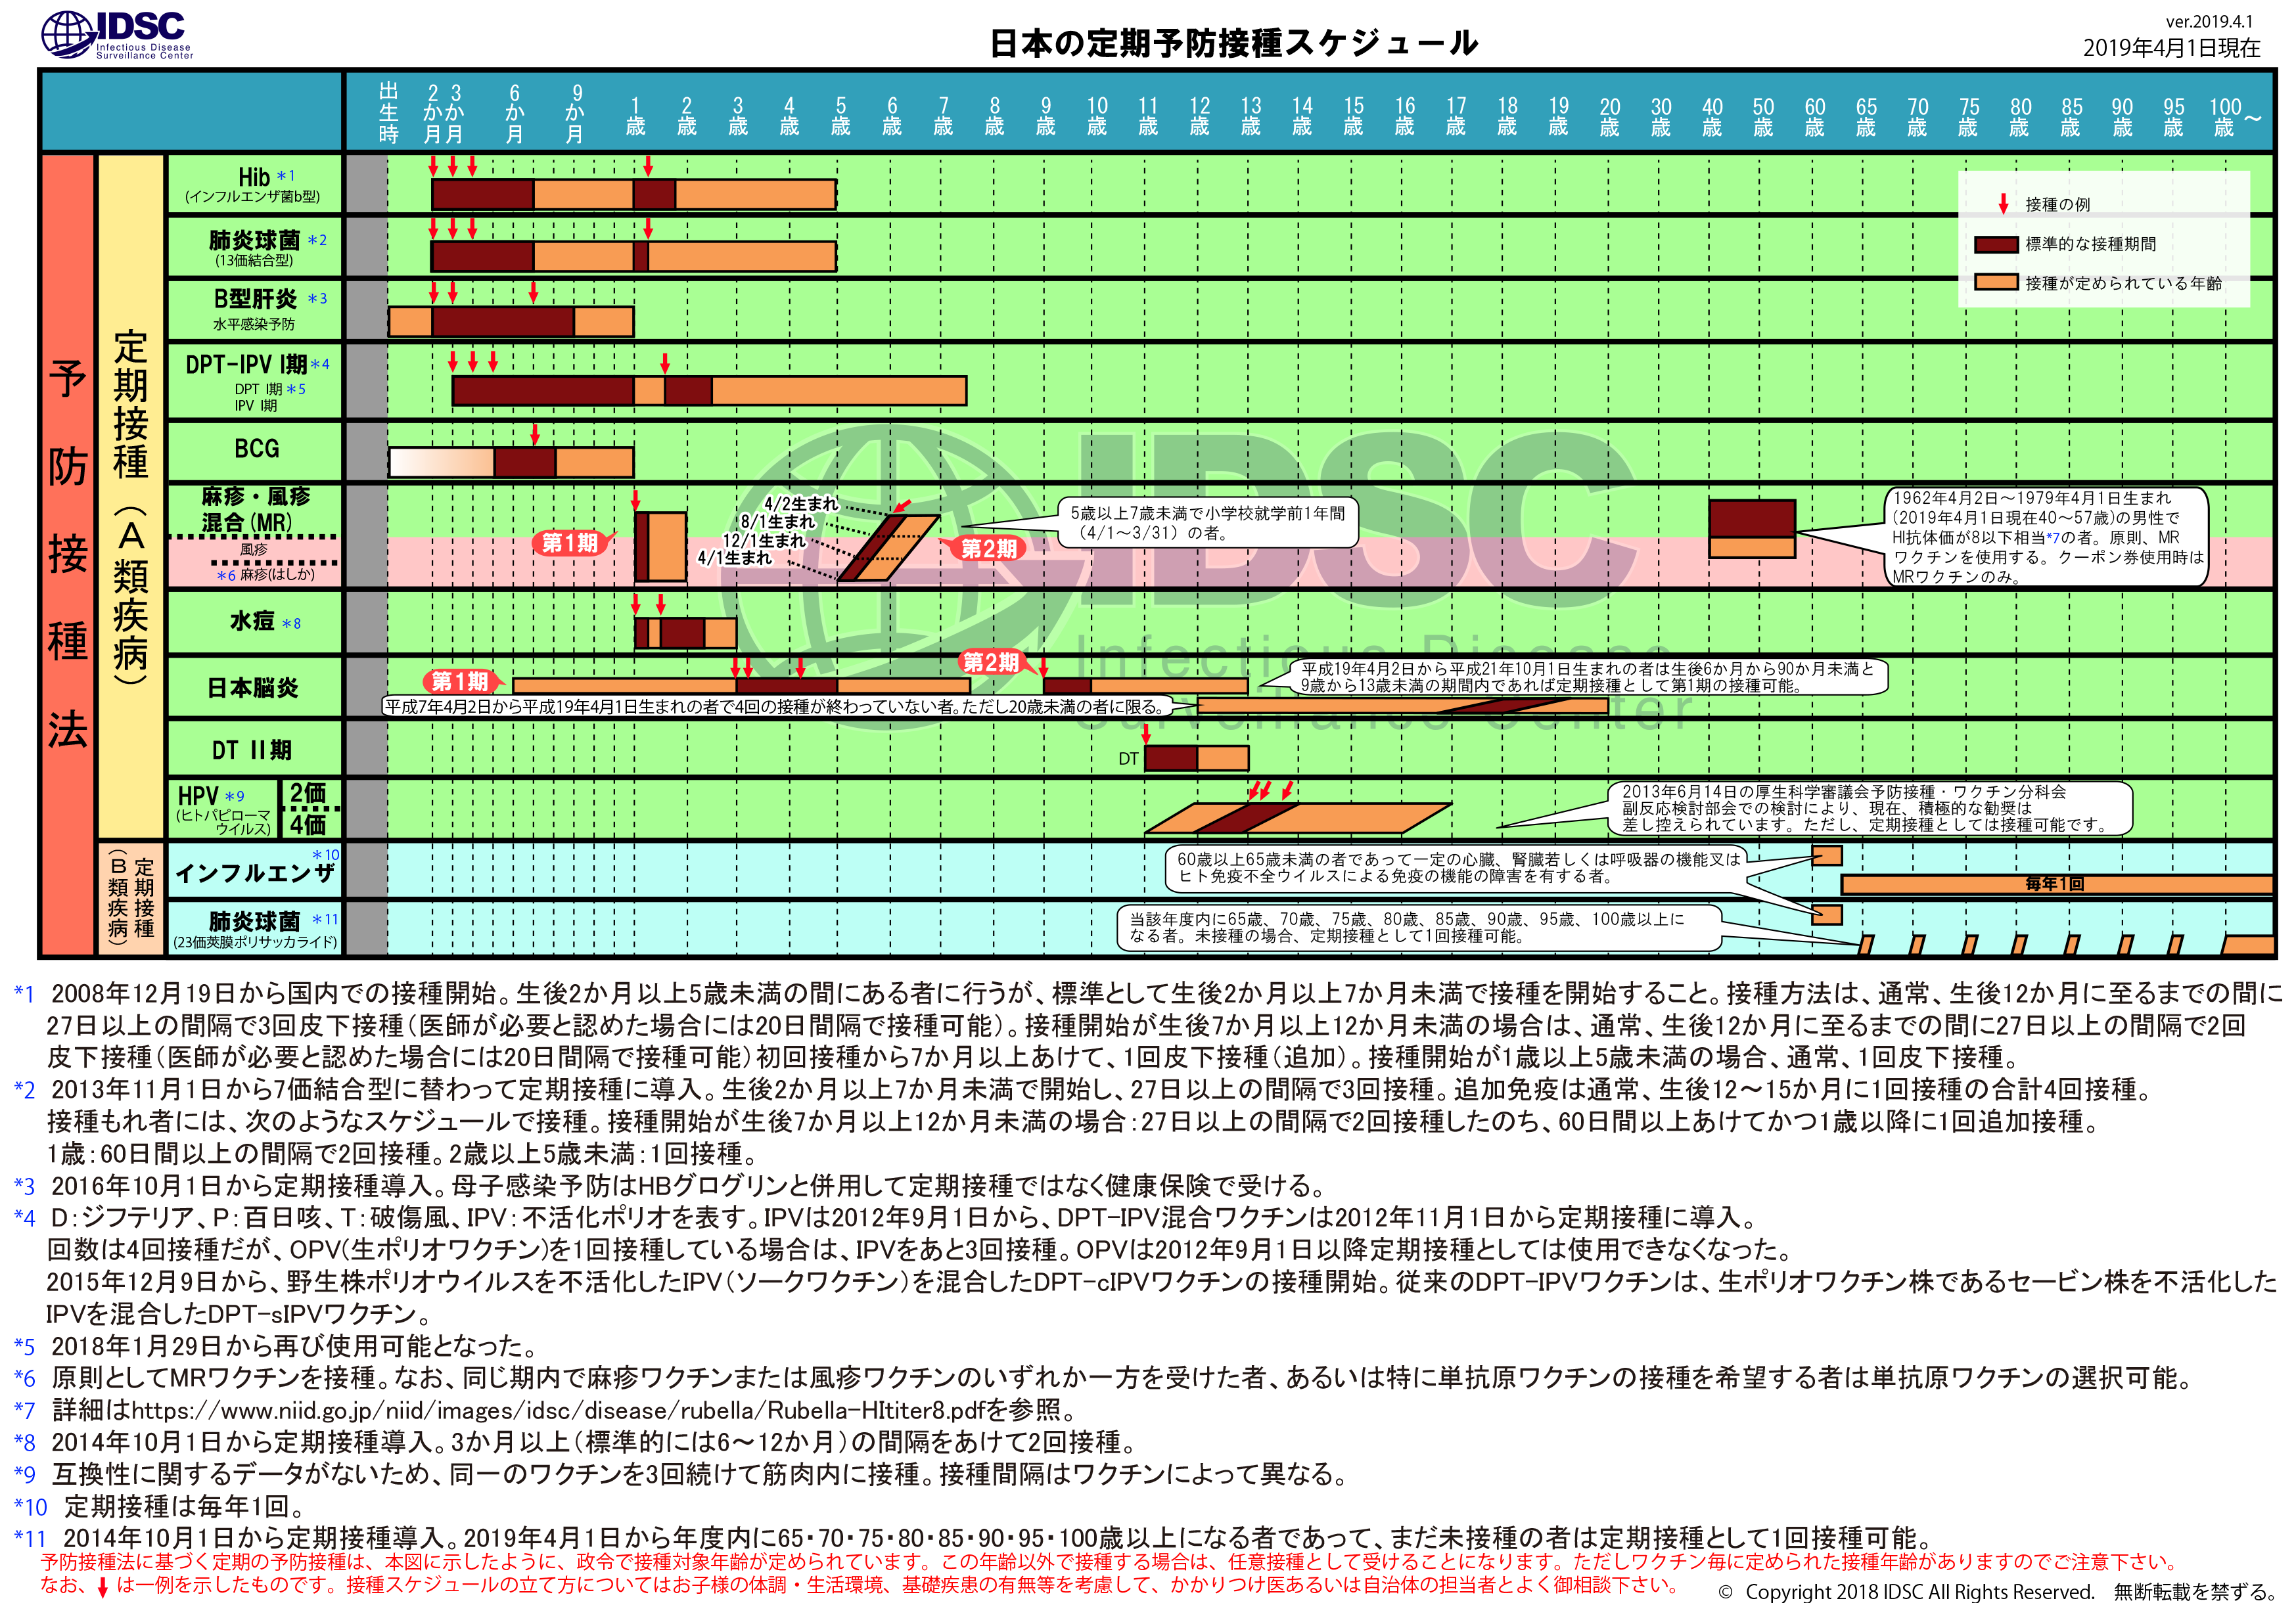 Bcg 日本 株